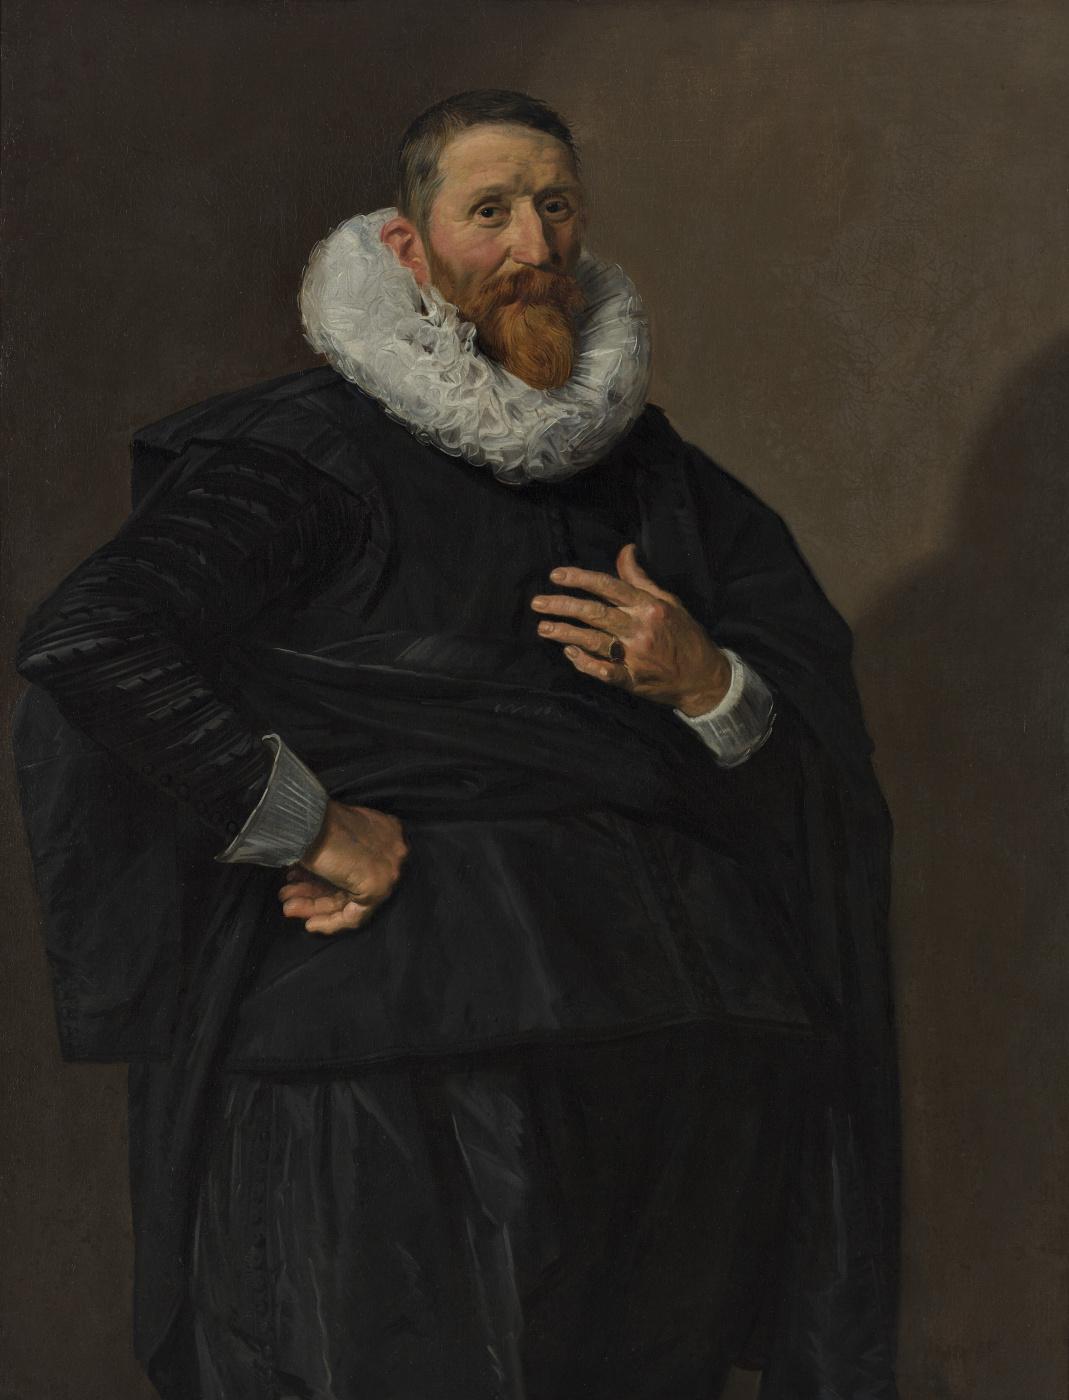 Frans Hals. Portrait of a Man